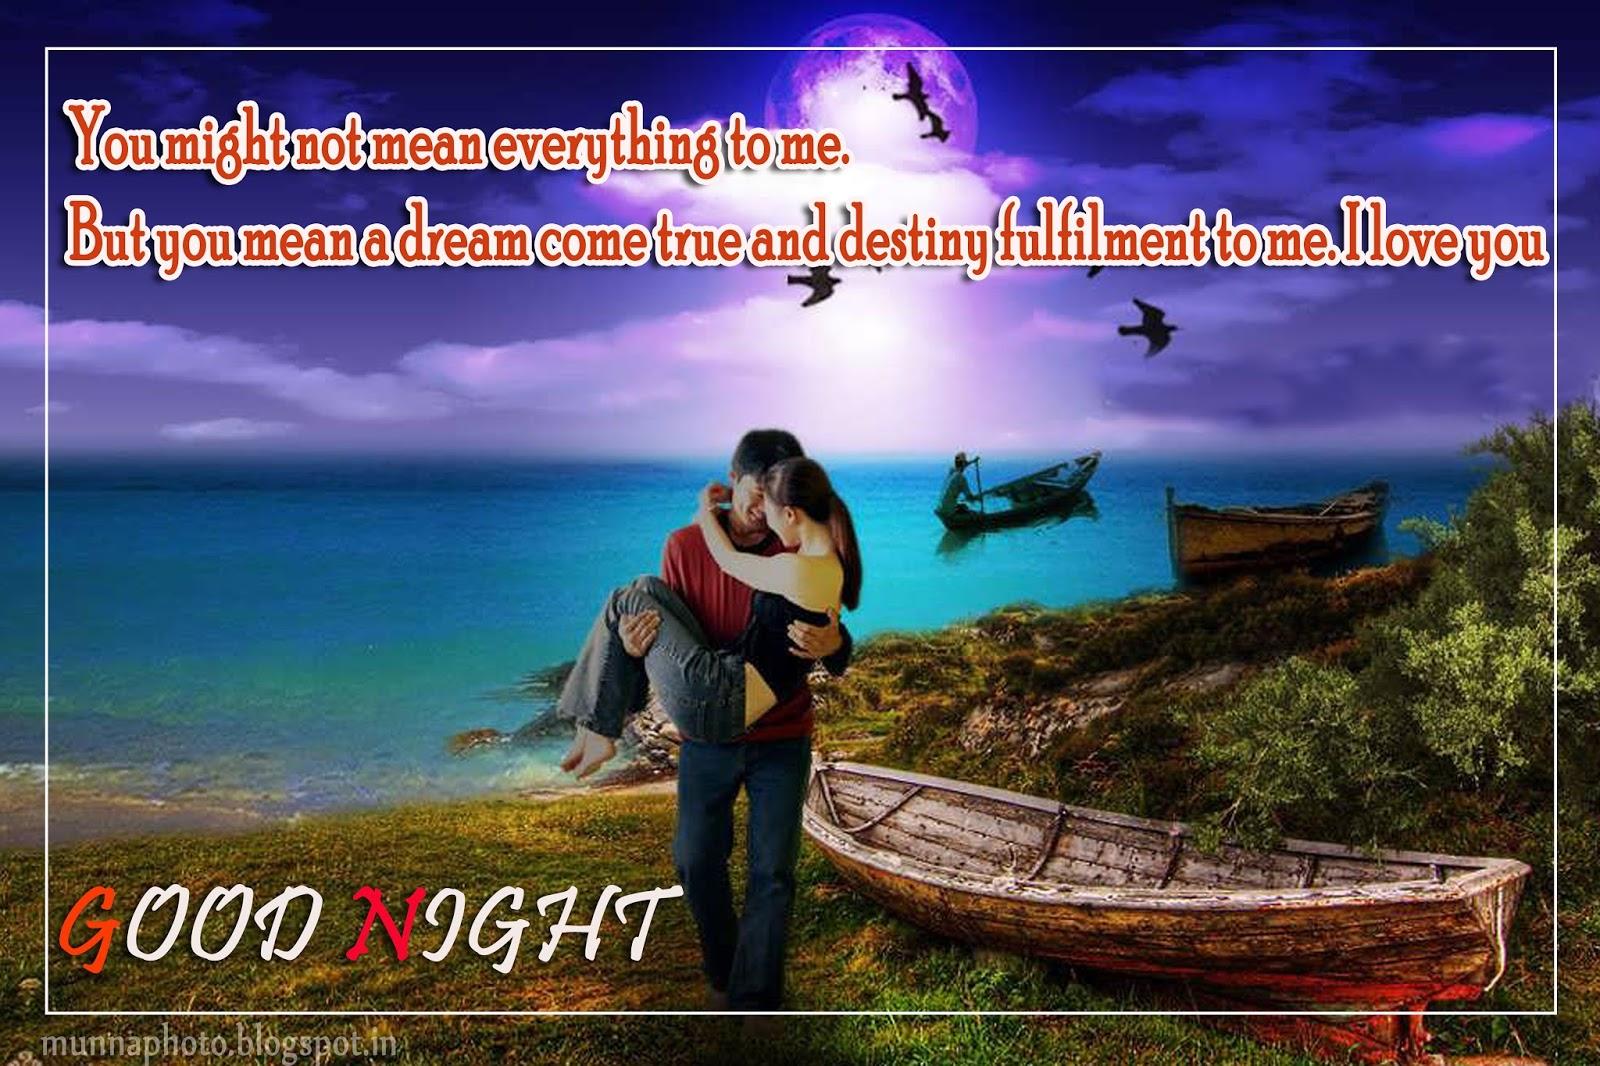 Must see Wallpaper Night Couple - sweet-couple-romantic-good%2Bnight%2Bwallpaper  Snapshot.JPG